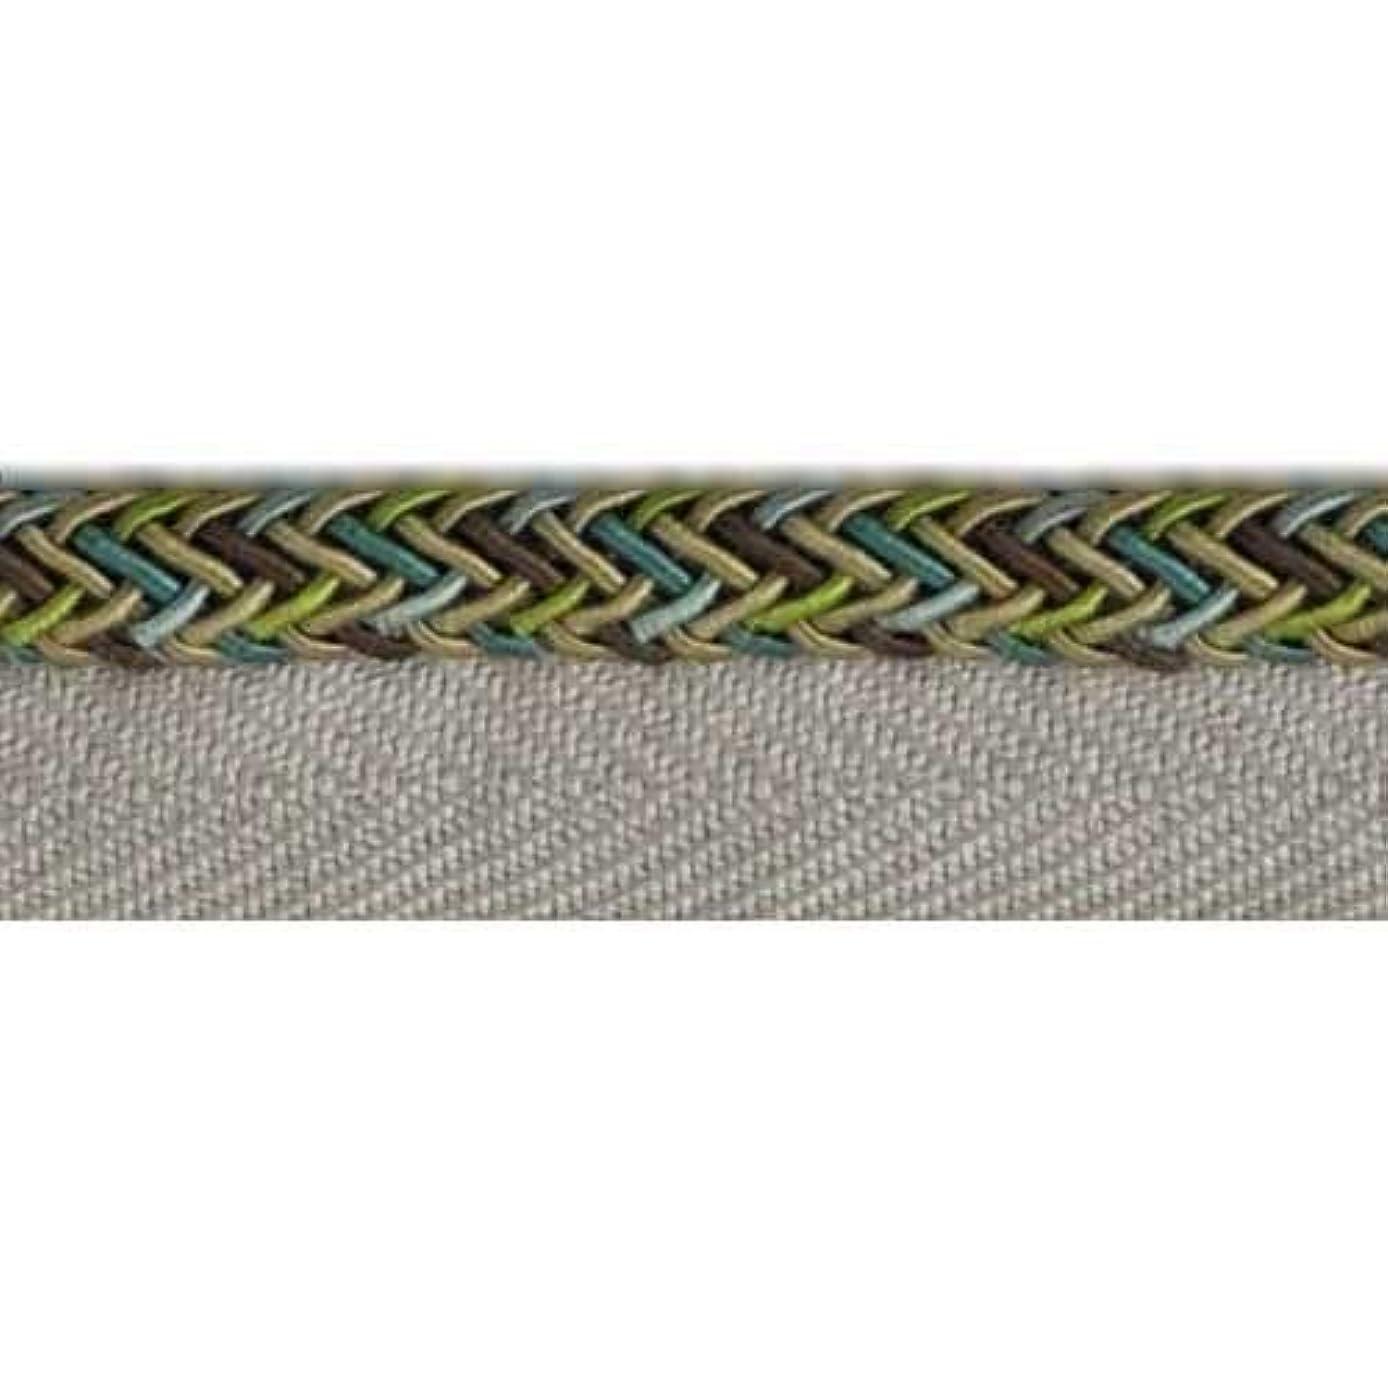 BELAGIO Enterprises BC-10002-23-63 Cord with Lip Teal